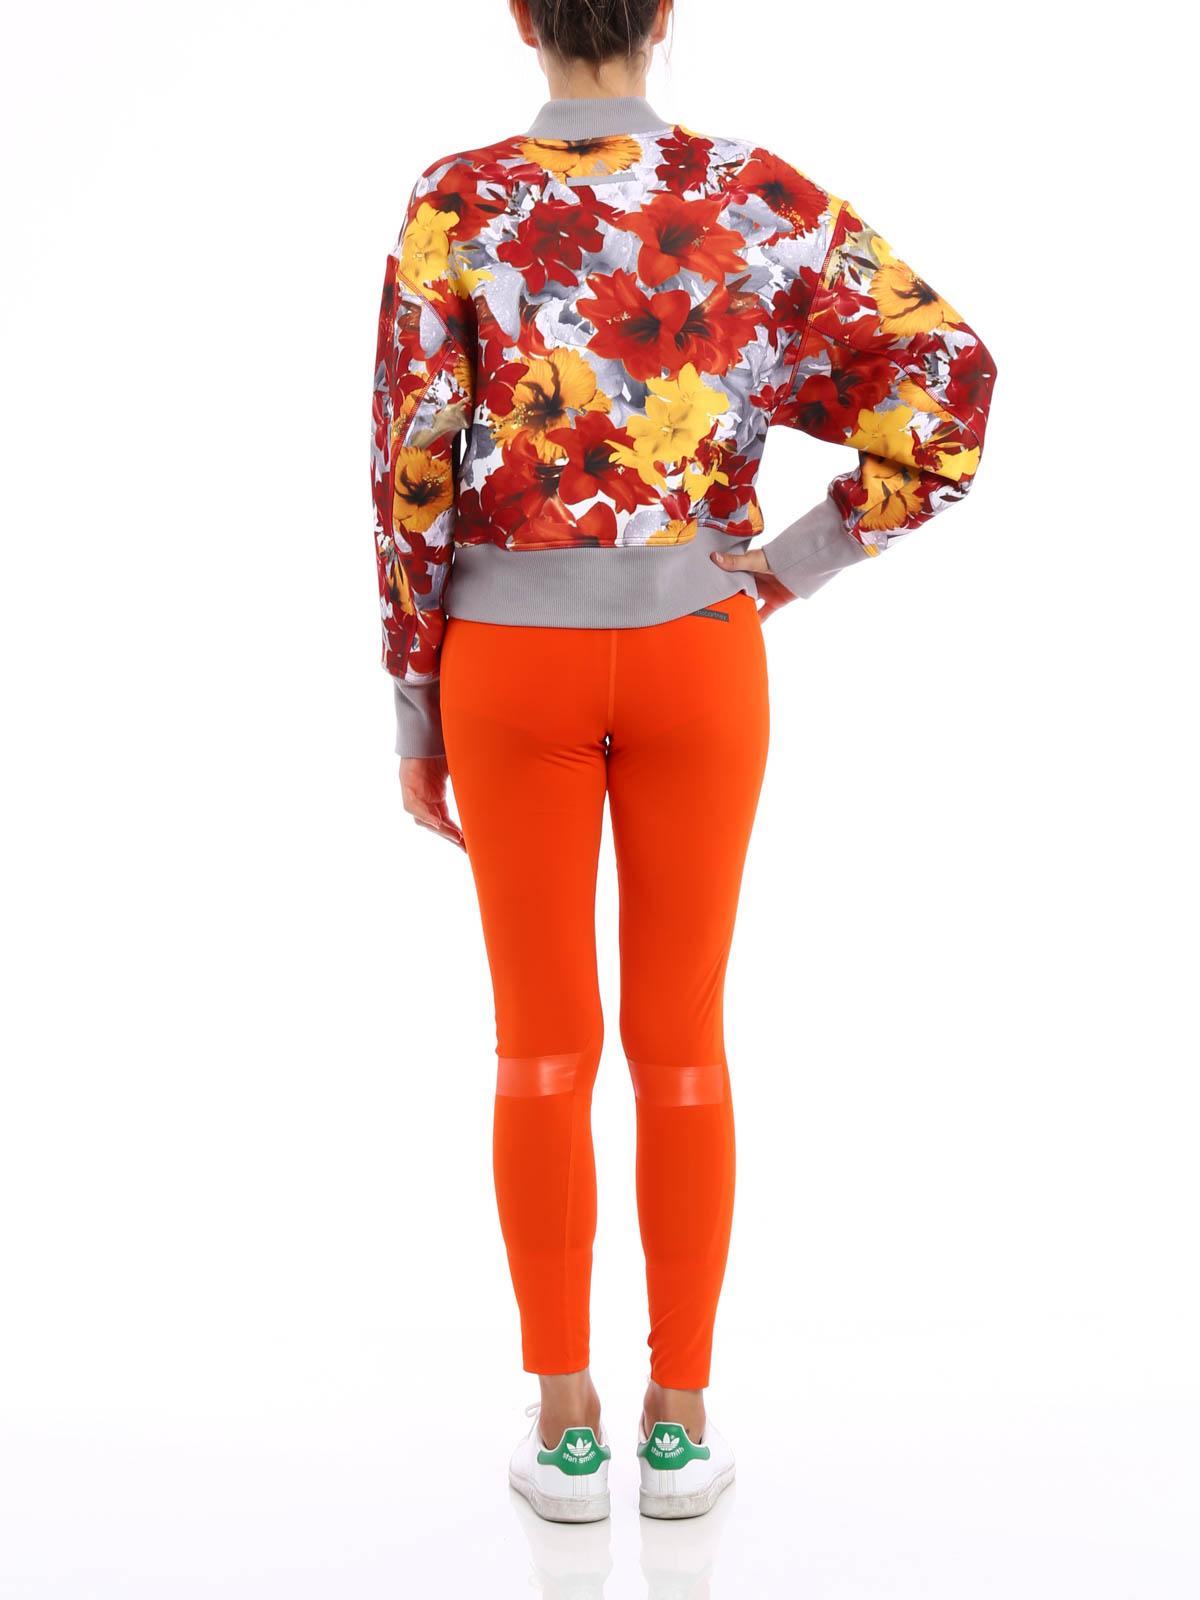 Stella Mccartney Outlet Adidas Nederland The Art Of Mike Mignola